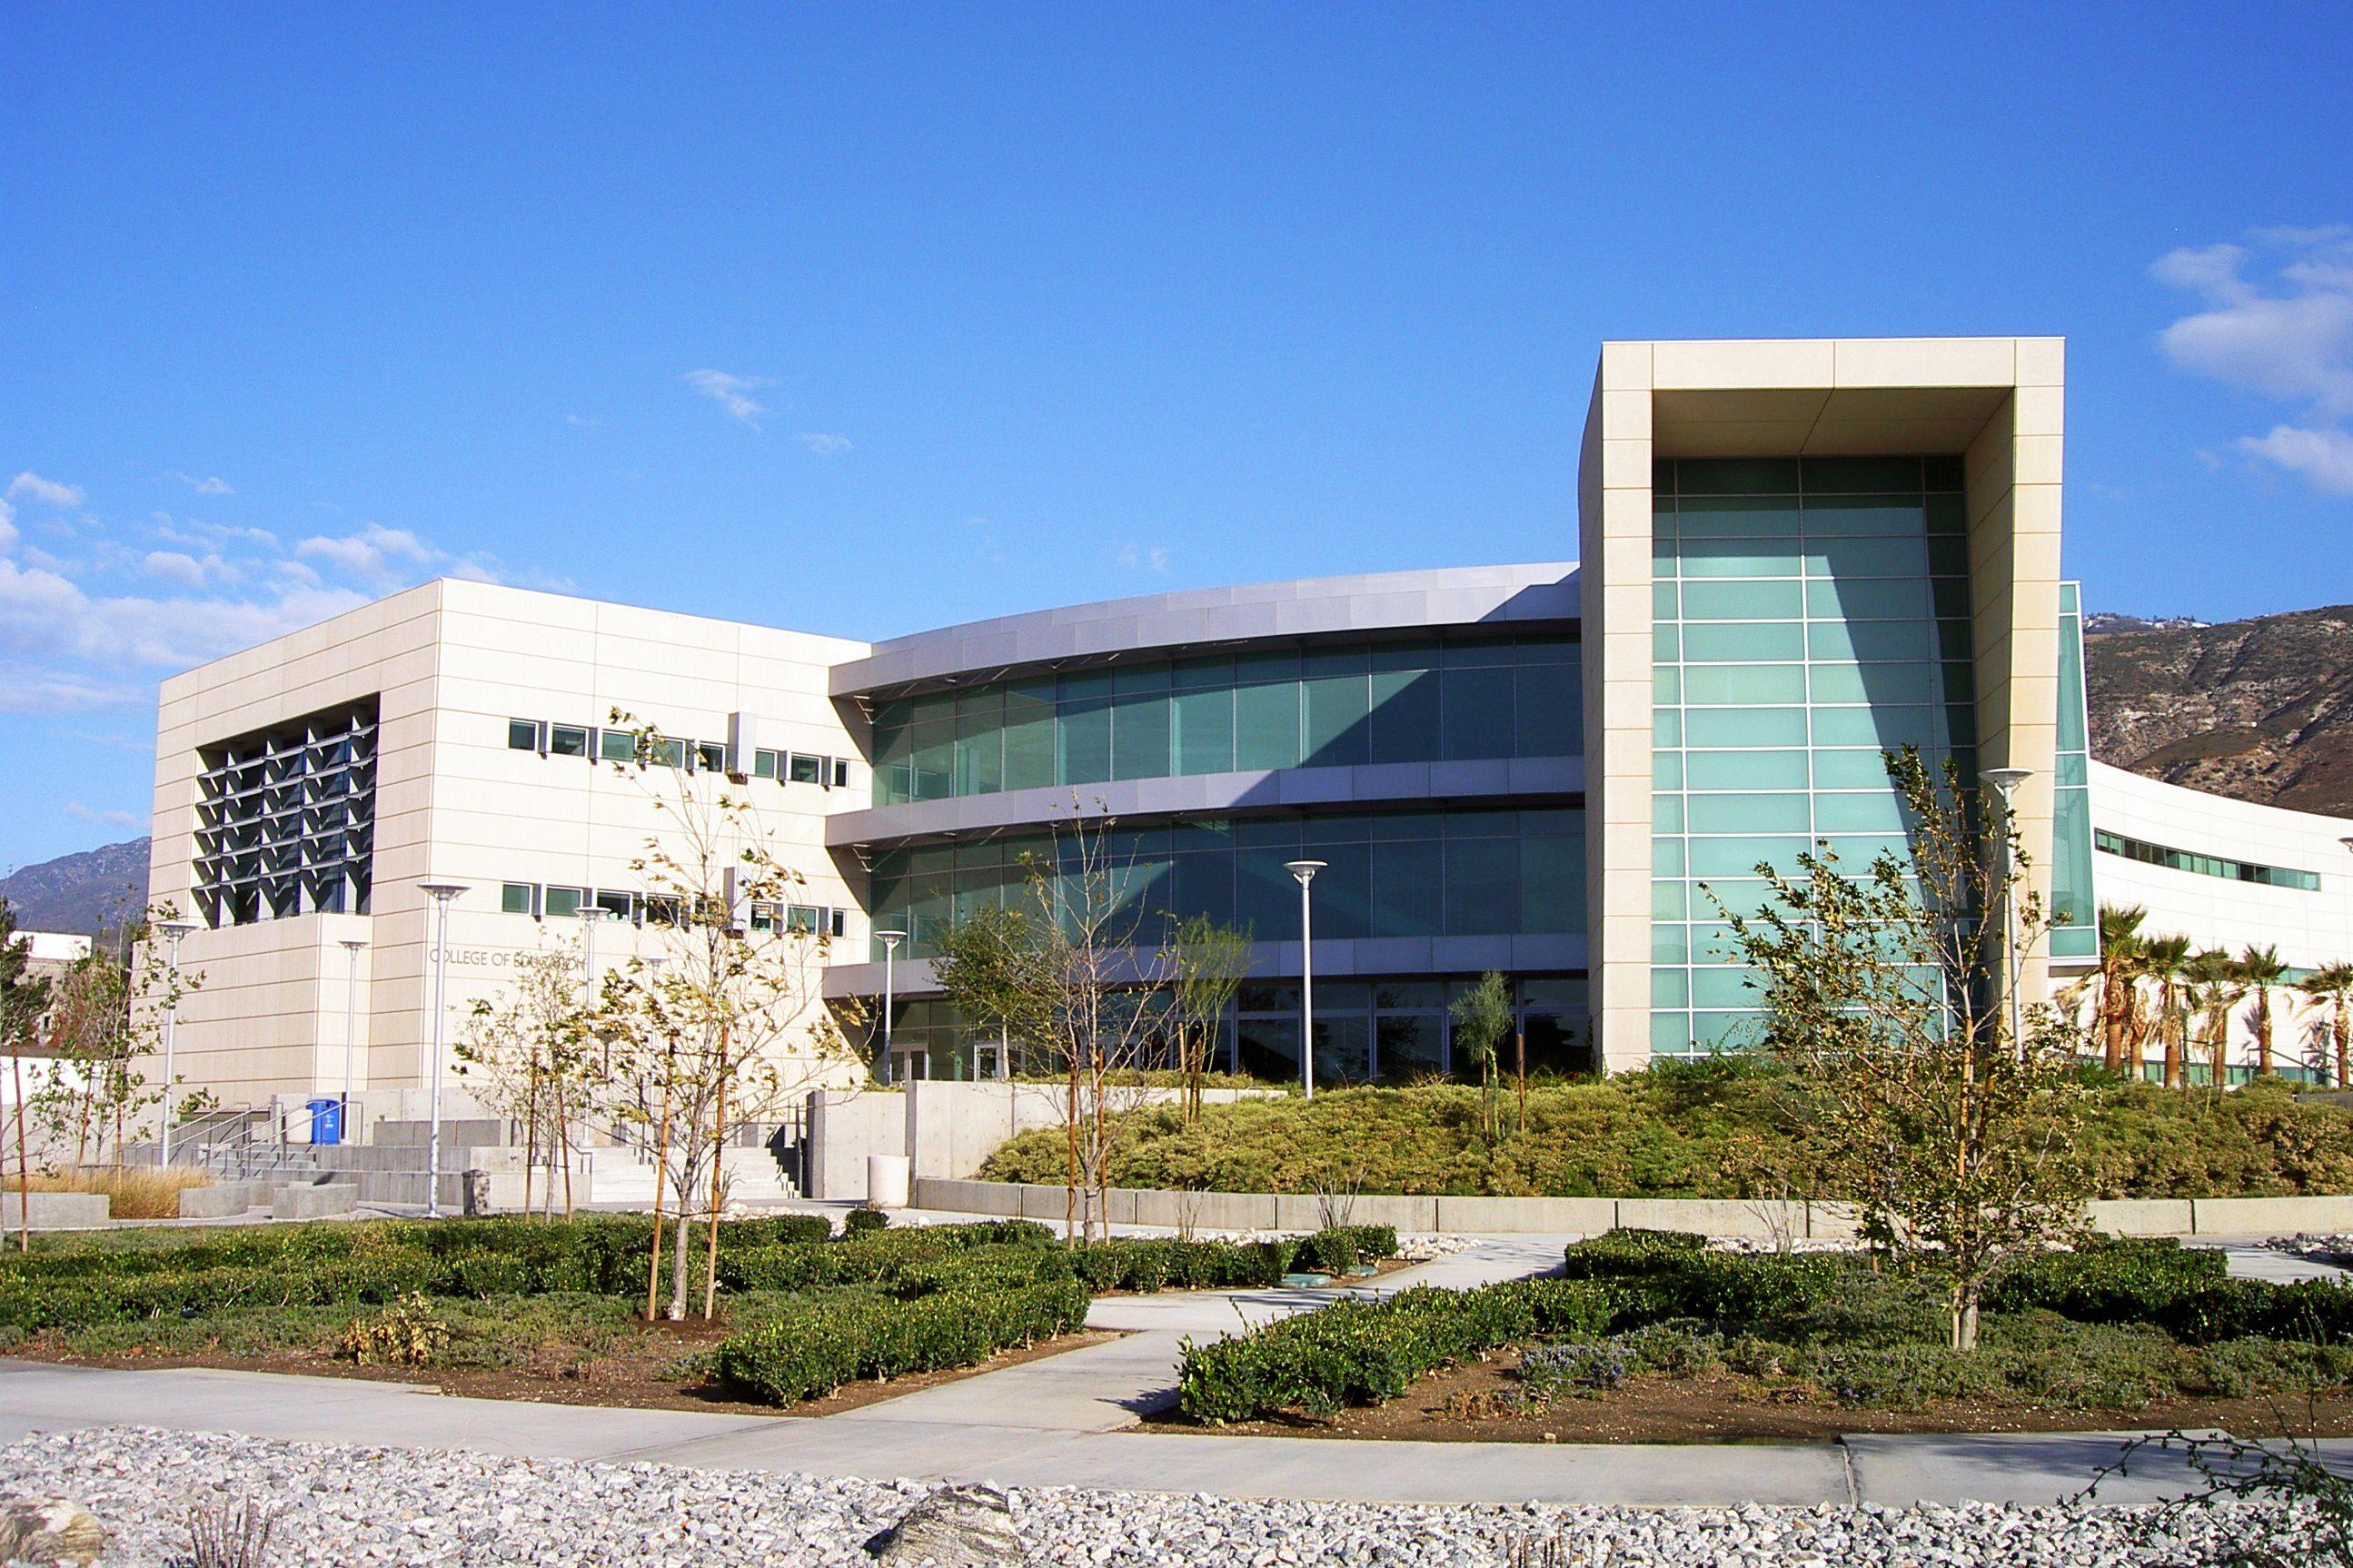 The College of Education at CSUSB, the California State University San Bernardino